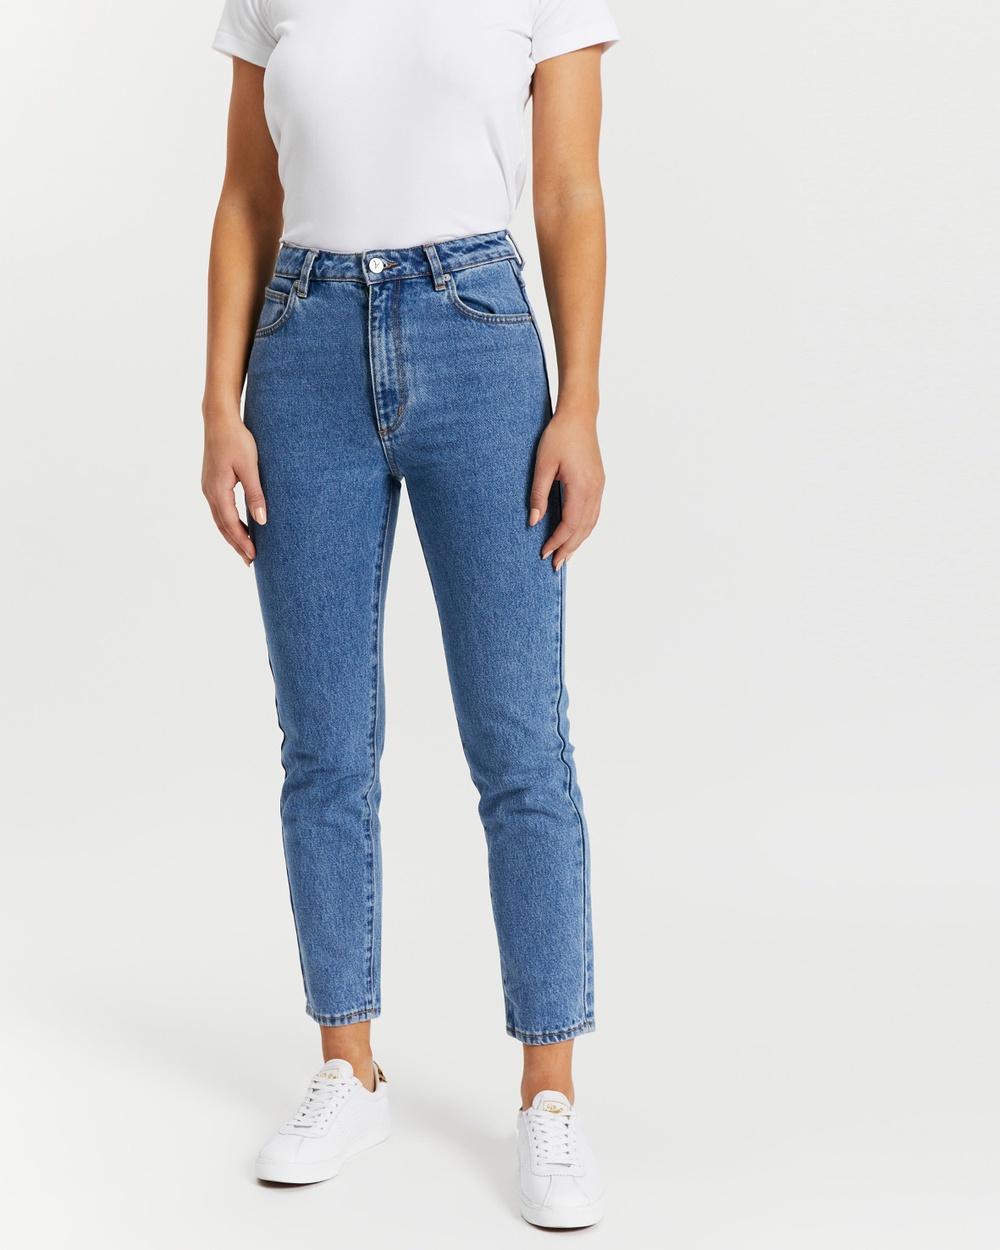 Abrand A '94 High Slim Jeans Zoe Organic